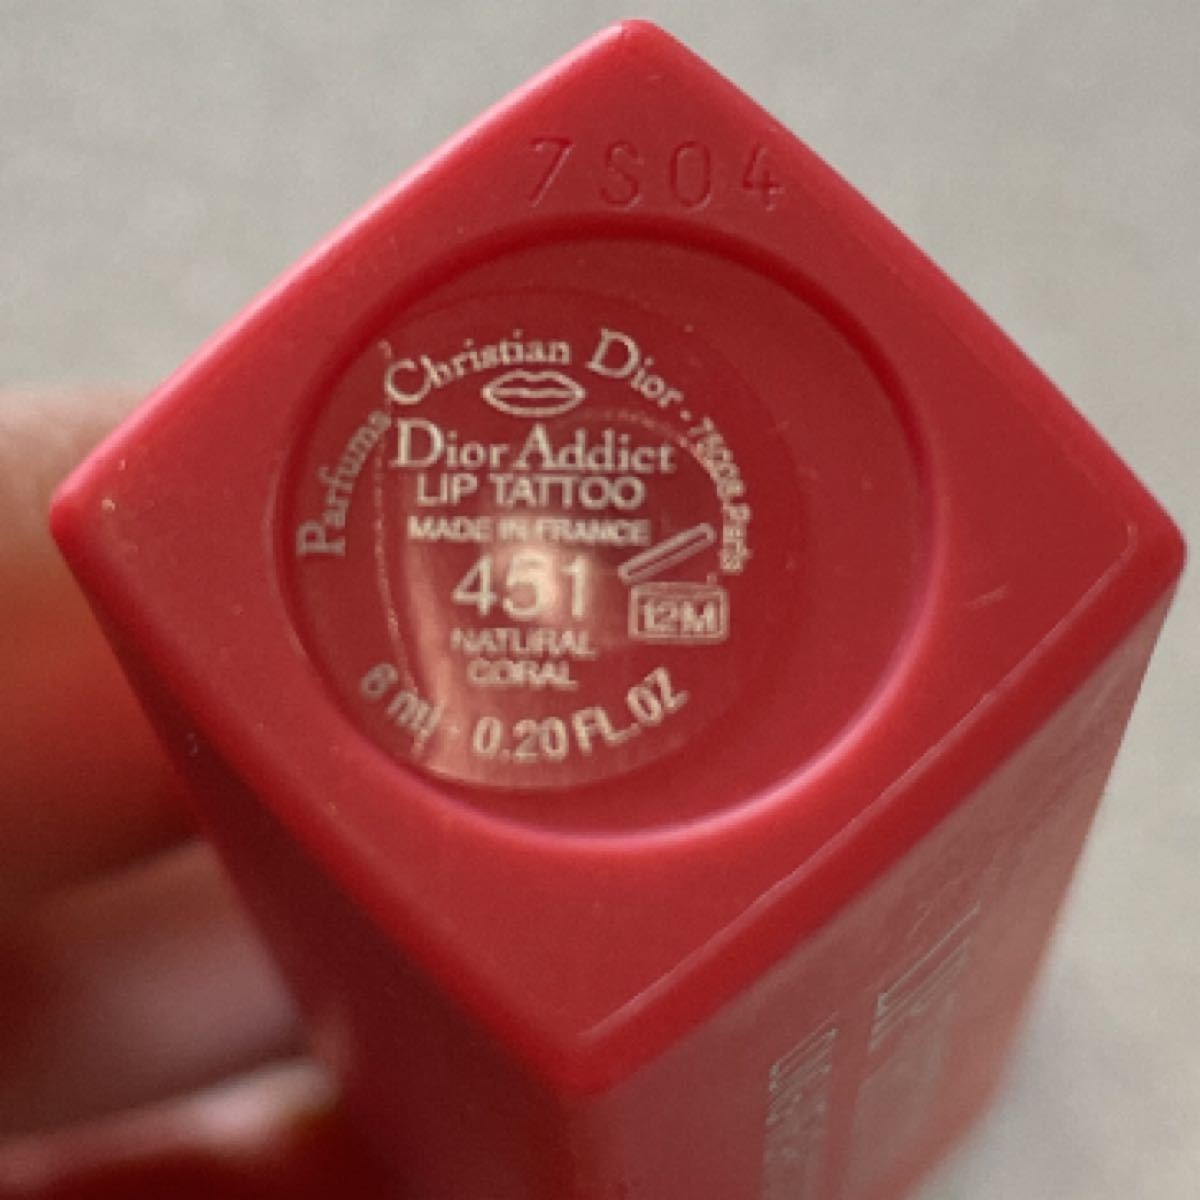 Dior ディオール アディクト リップティント リップタトゥー 451